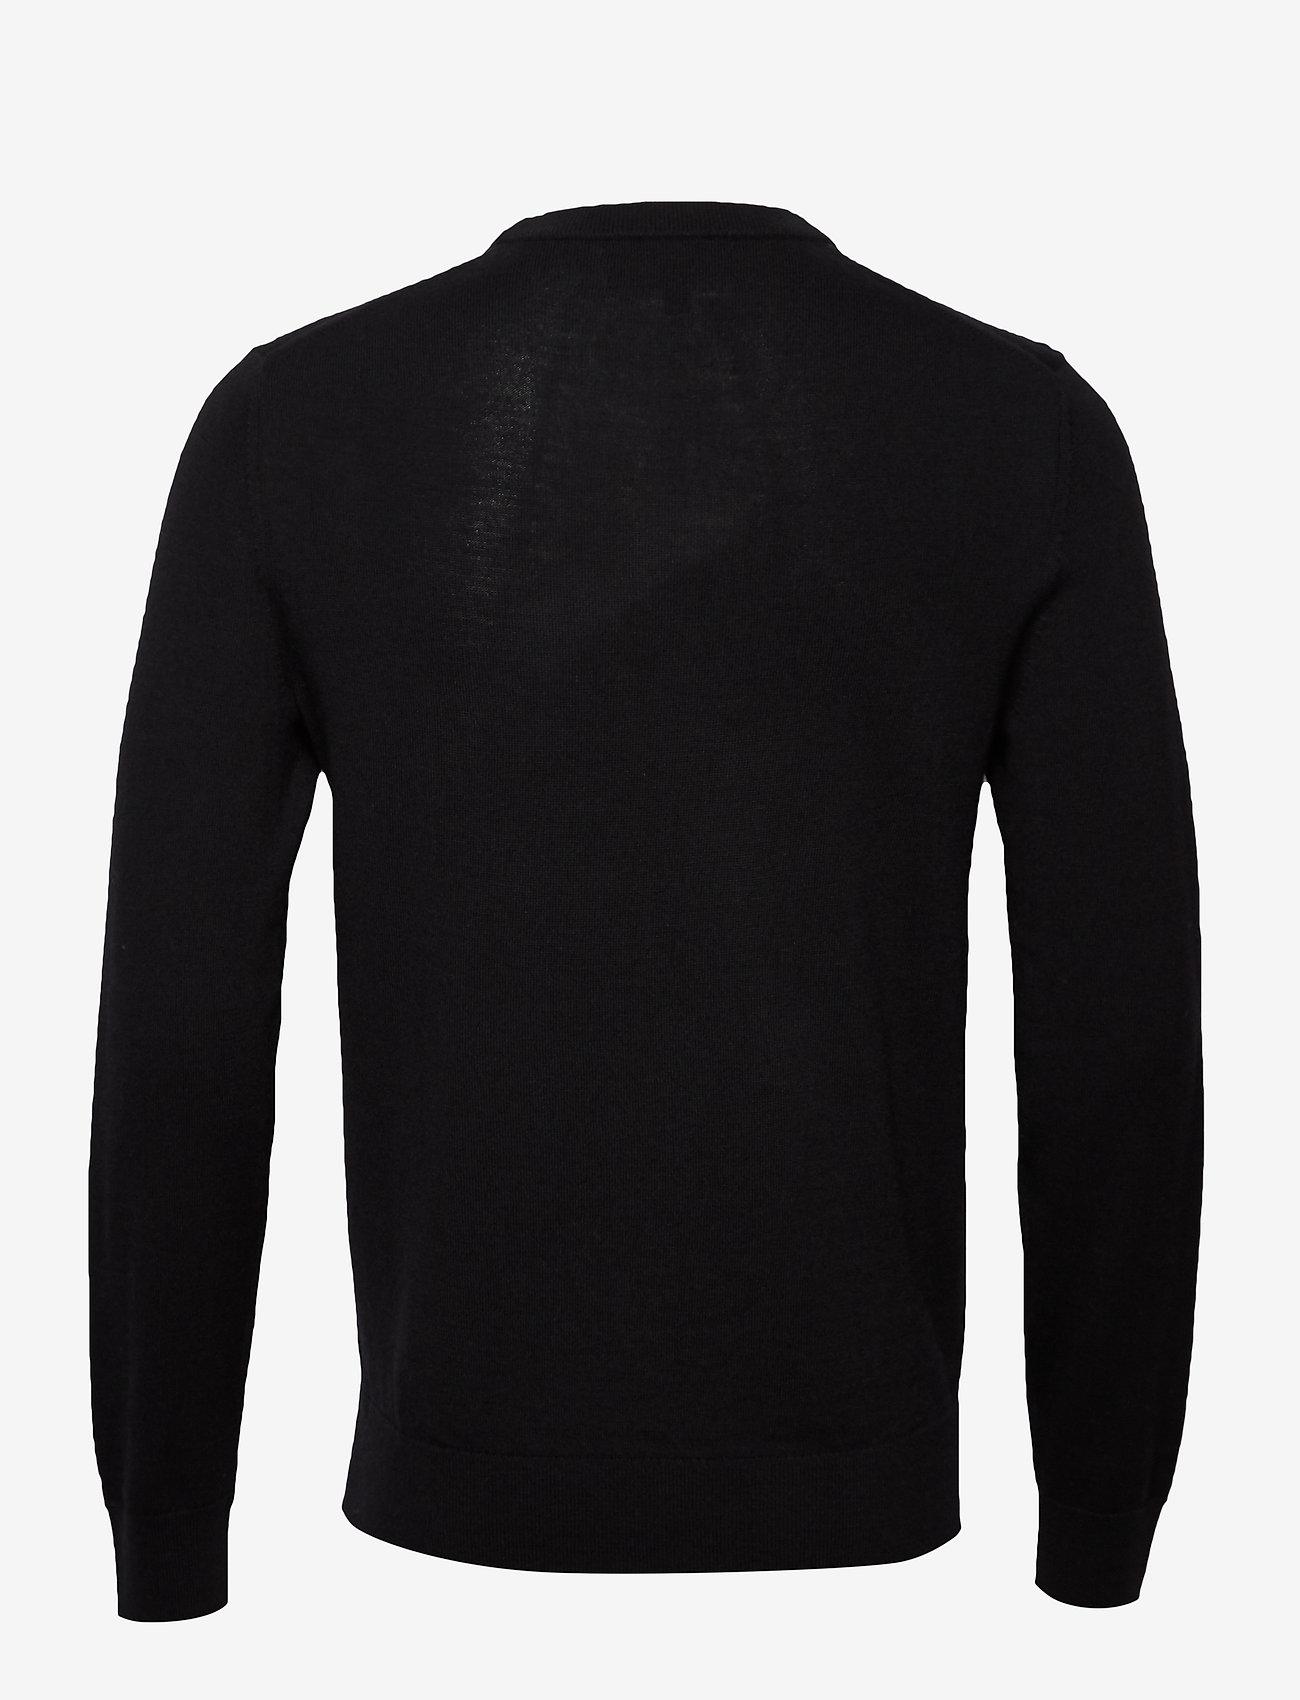 Banana Republic - Italian Merino Crew-Neck Sweater - basic knitwear - black - 1